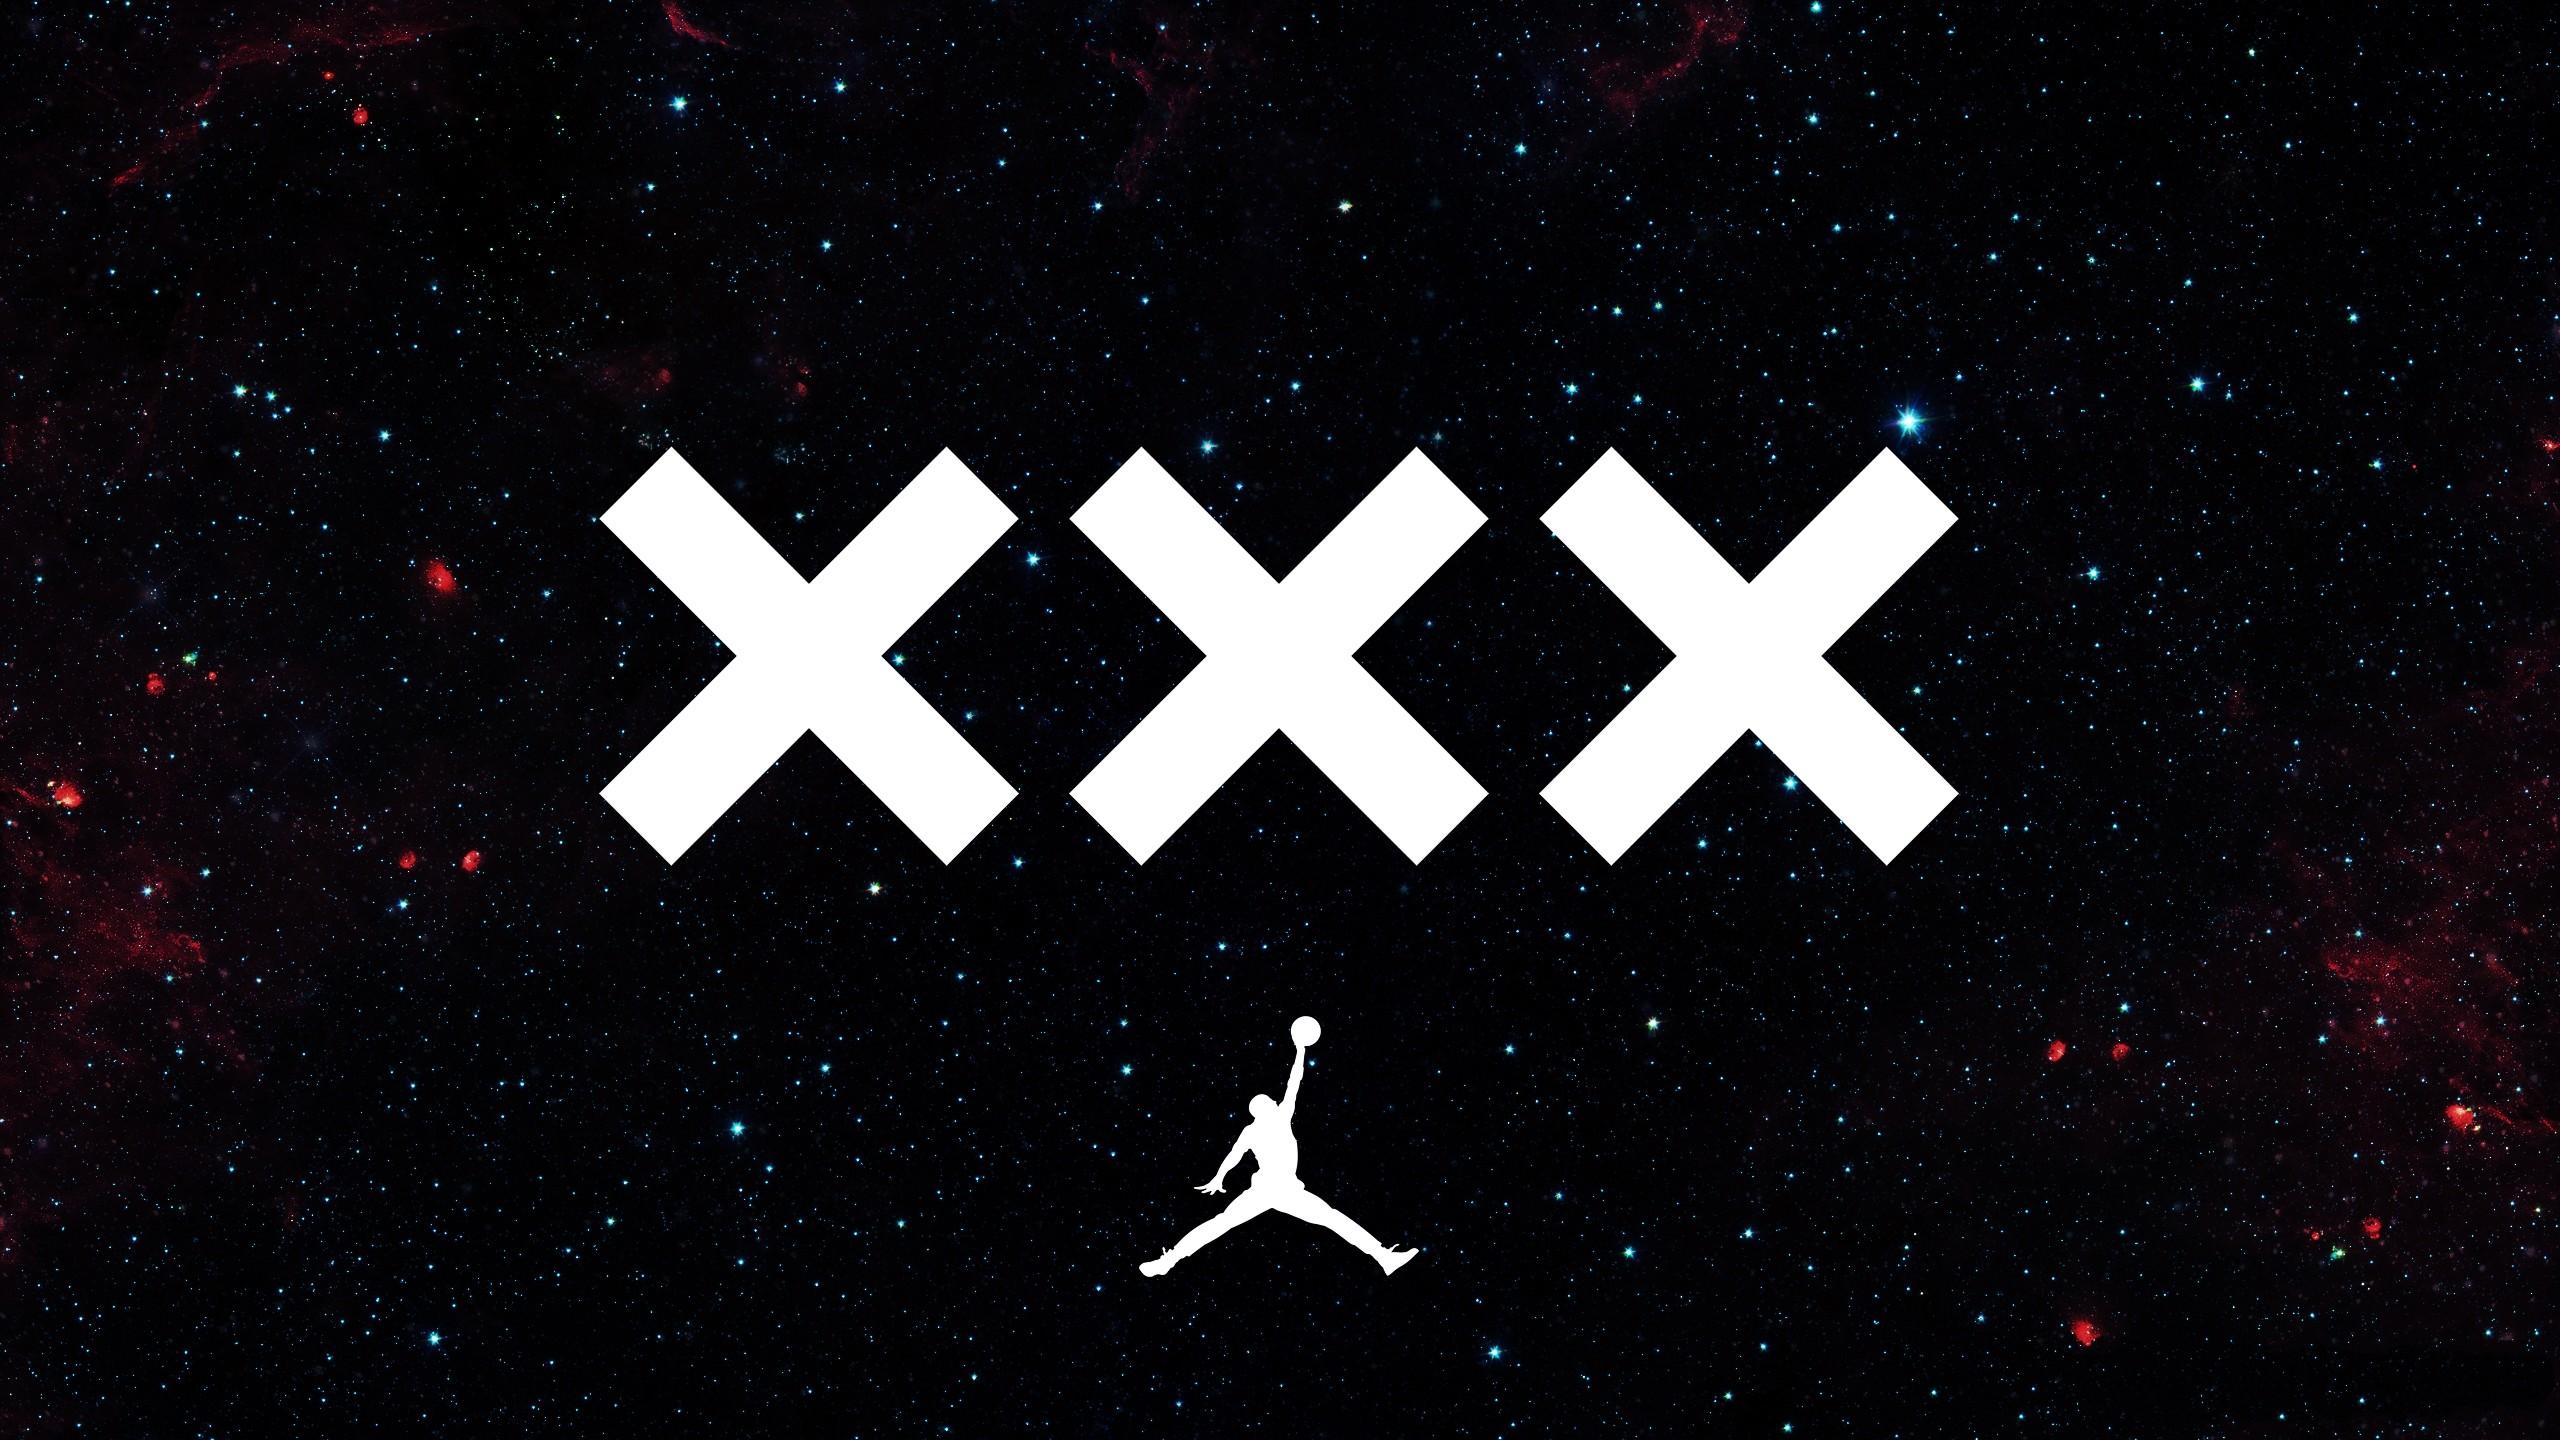 wallpaper.wiki-HD-Air-Jordan-Shoes-Backgrounds-PIC-